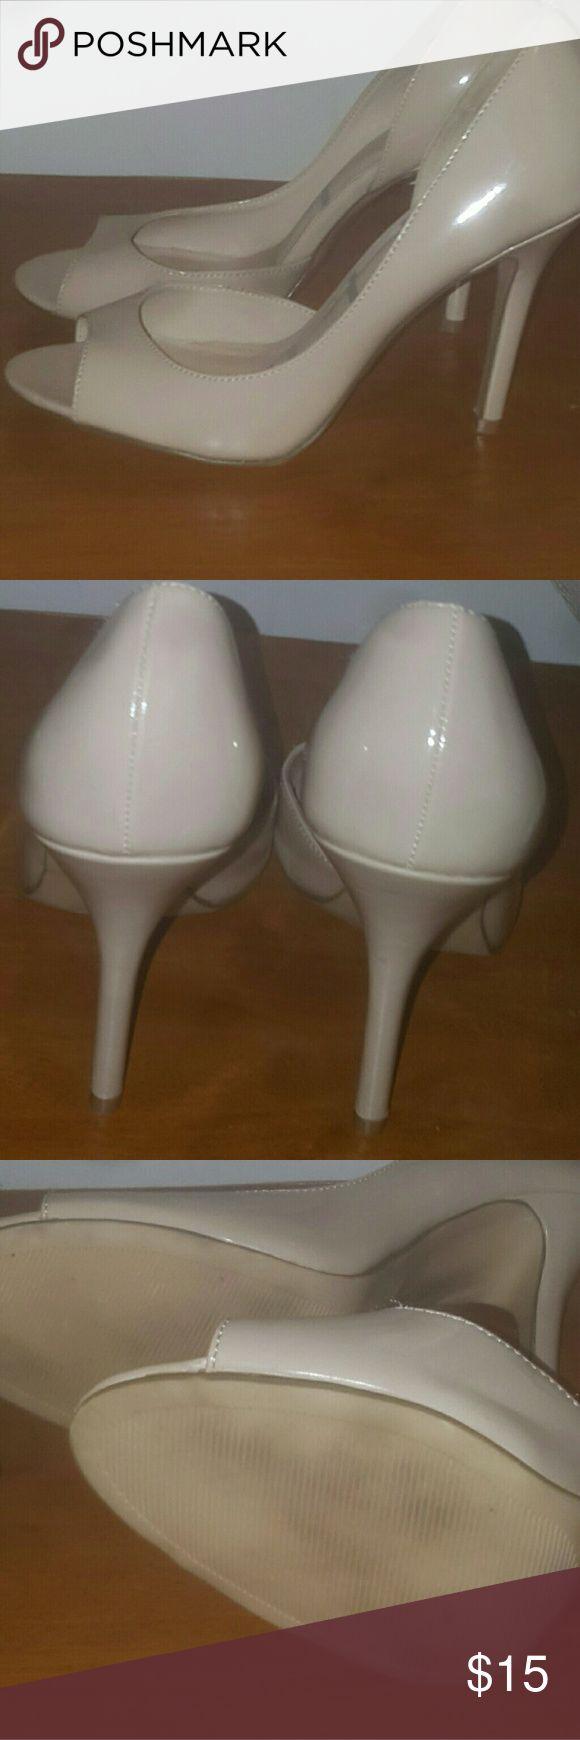 ELLE High heel Shoe Great condition very comfortable 8m Elle Shoes Heels